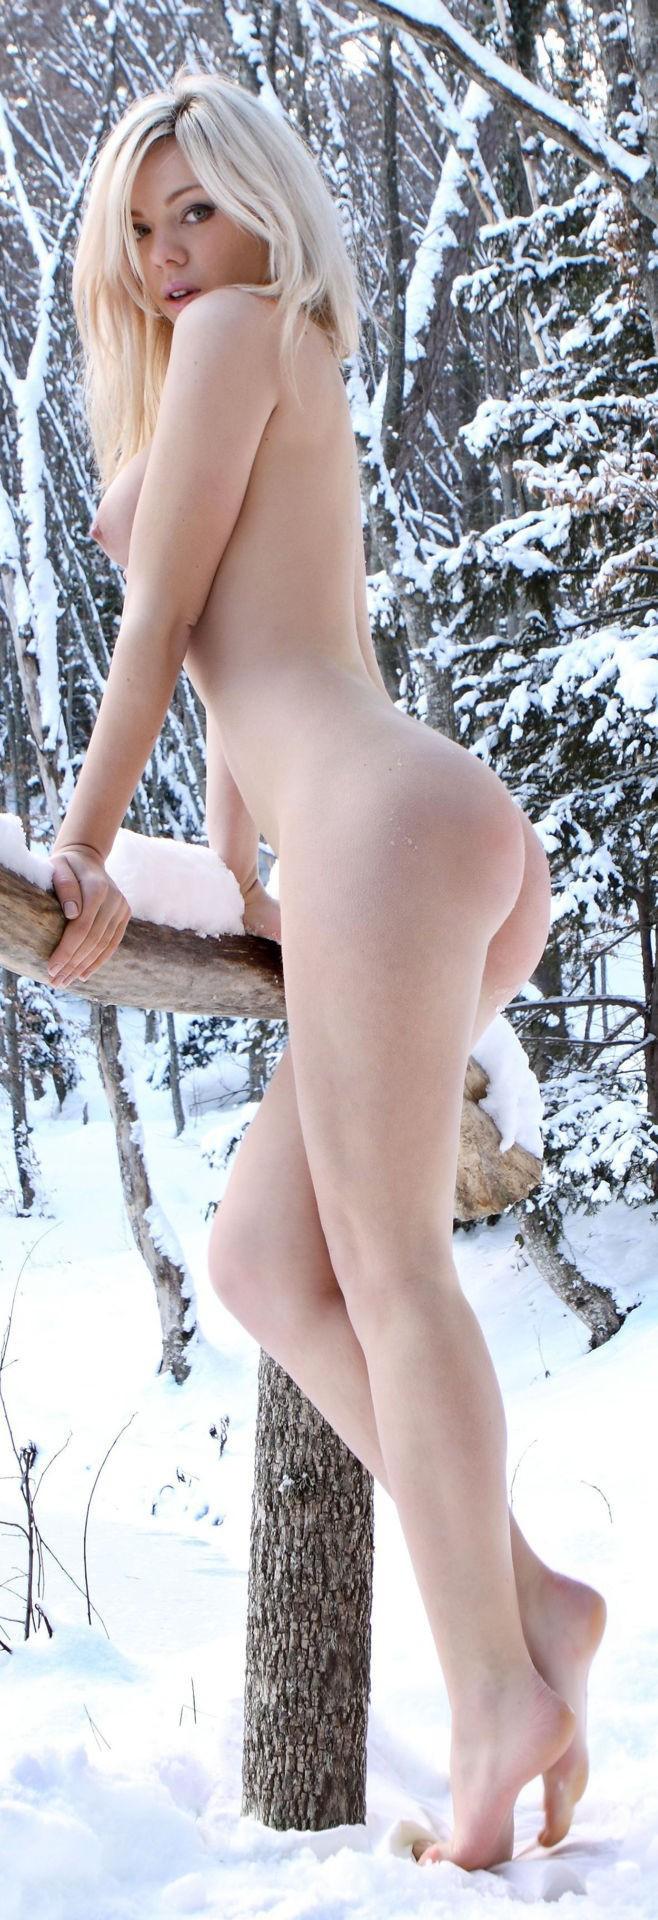 private presents apolonia lapiedra loses her anal virginity with private #analmasturbation #dildo #harleyquinn #lesbians #precummaker #twodildos #yummyfav